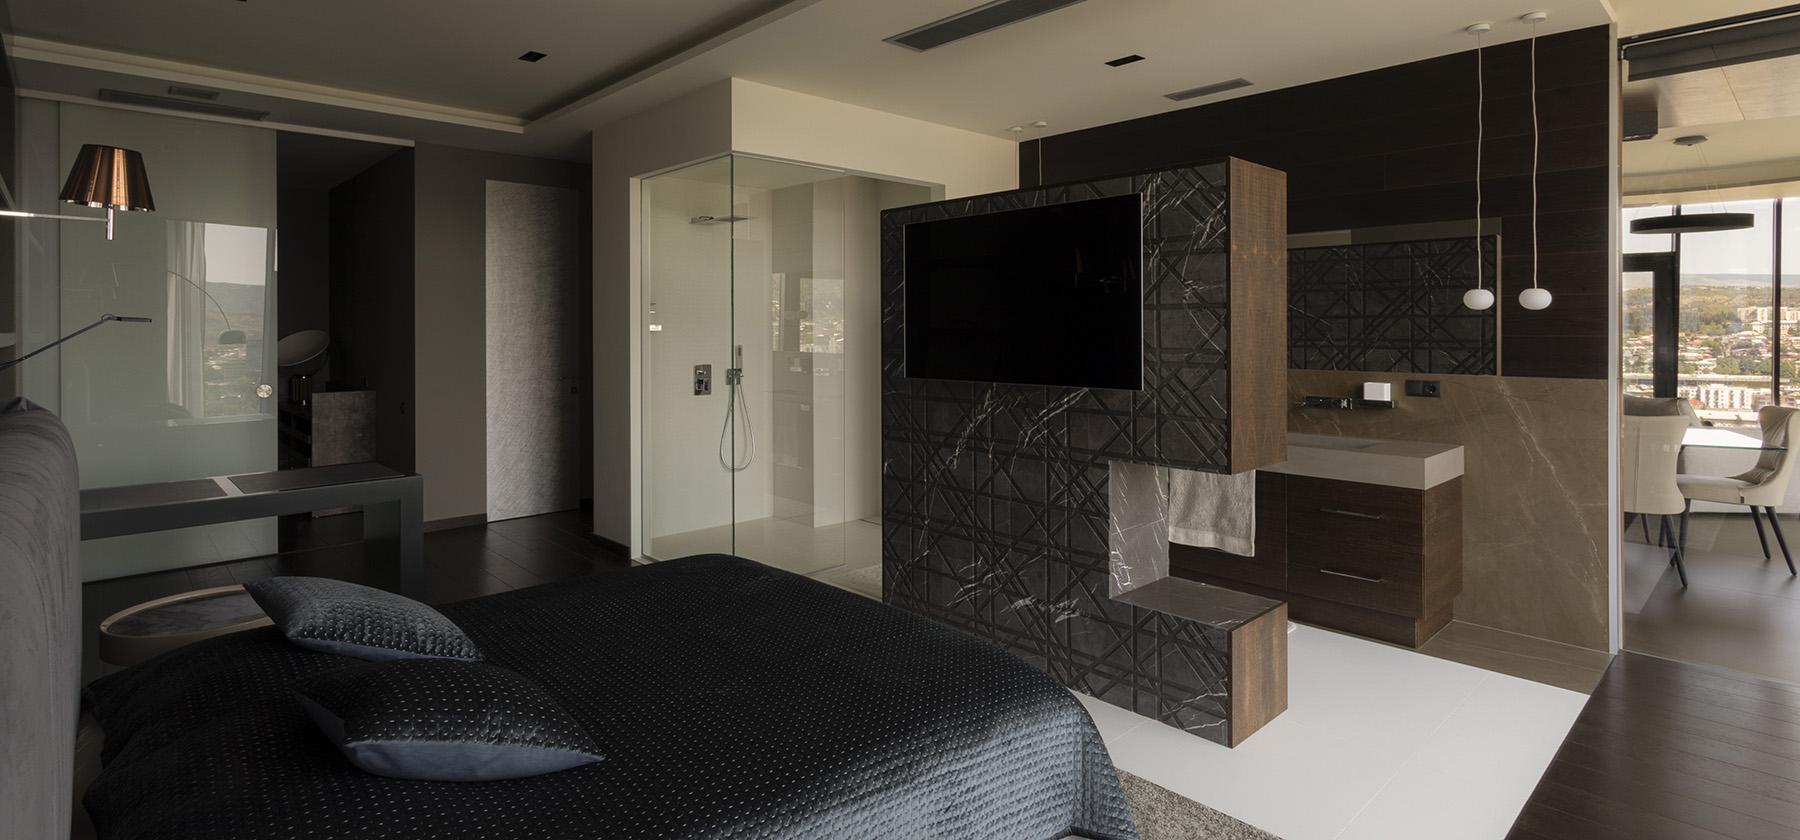 2_KingDavid_tartan_interior_wall_covering